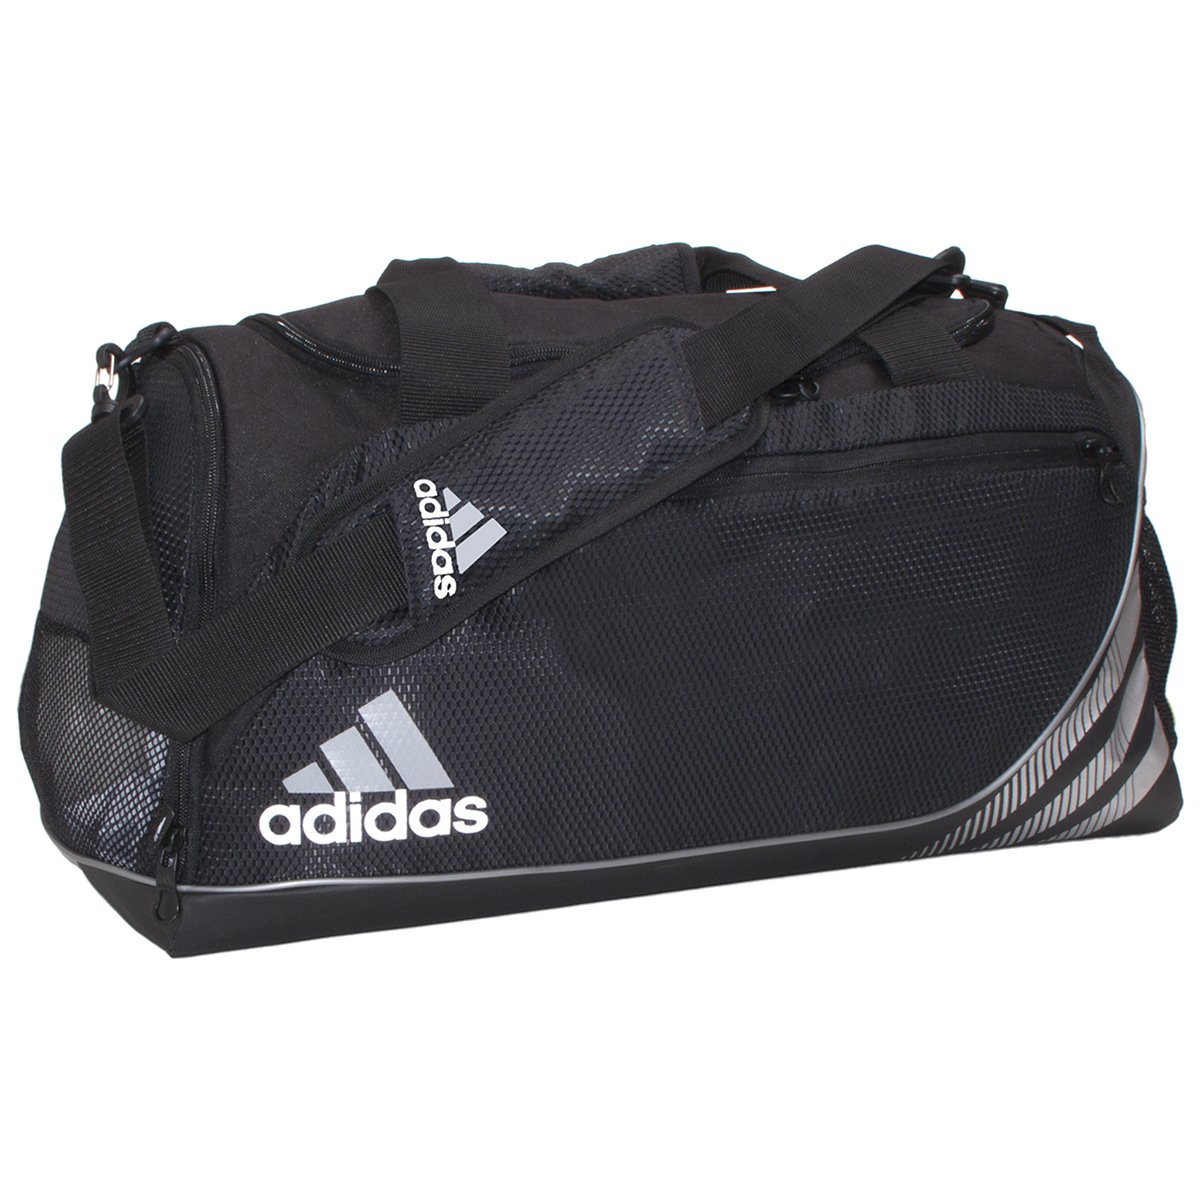 894c73e8d3 Amazon.com  adidas Team Speed Medium Duffel Bag